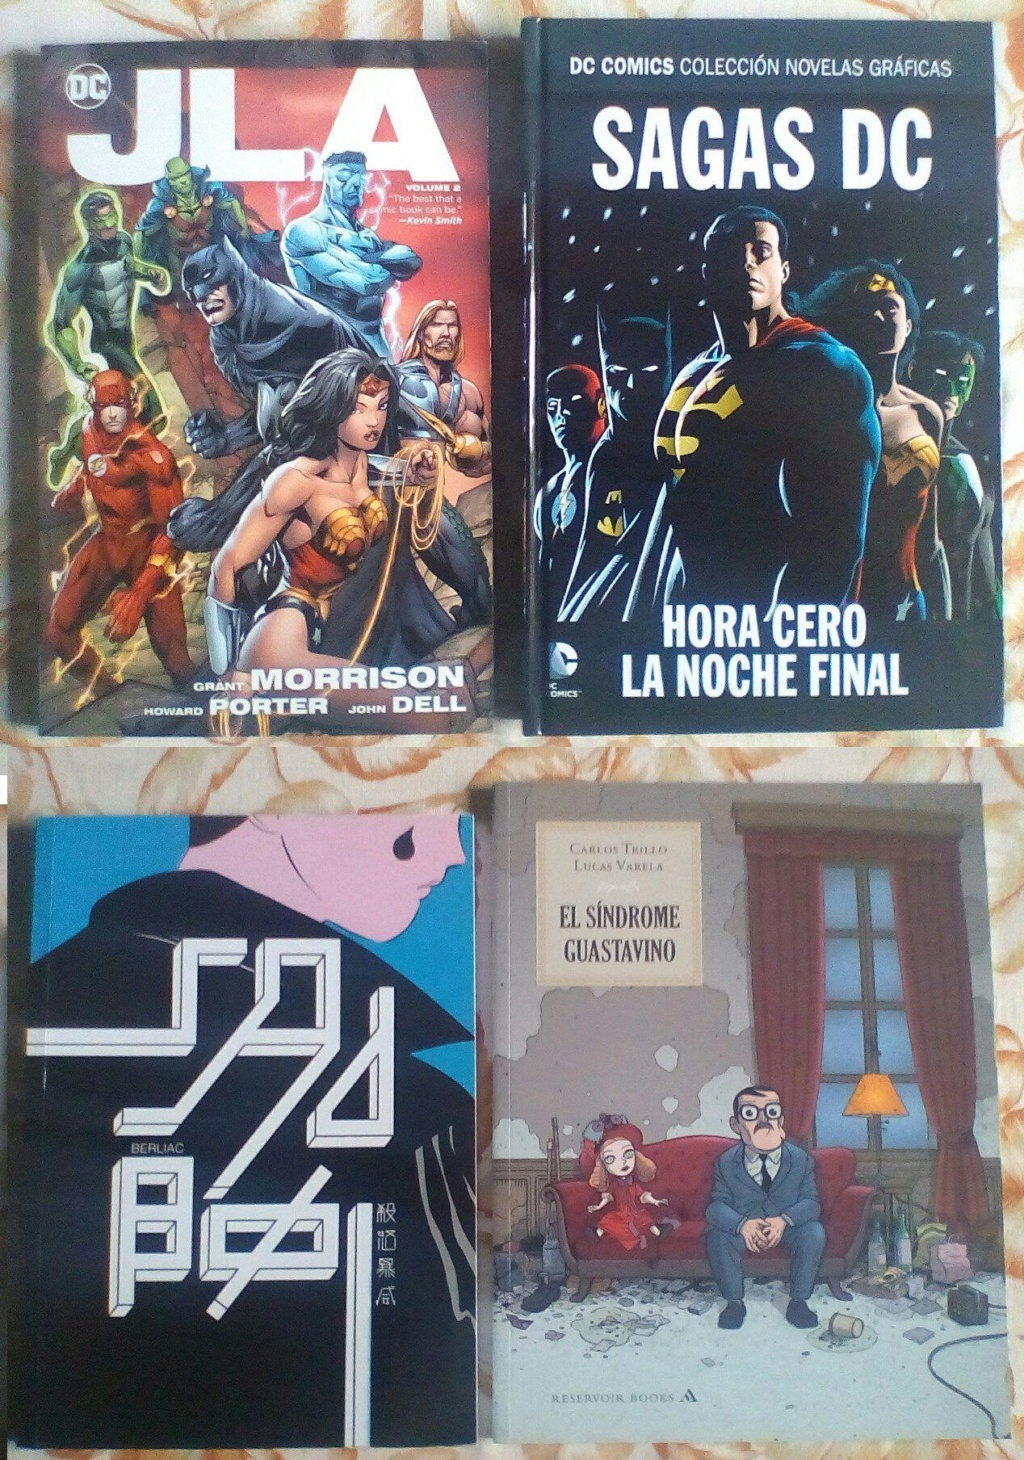 [Comics] Siguen las adquisiciones 2018 - Página 5 X10